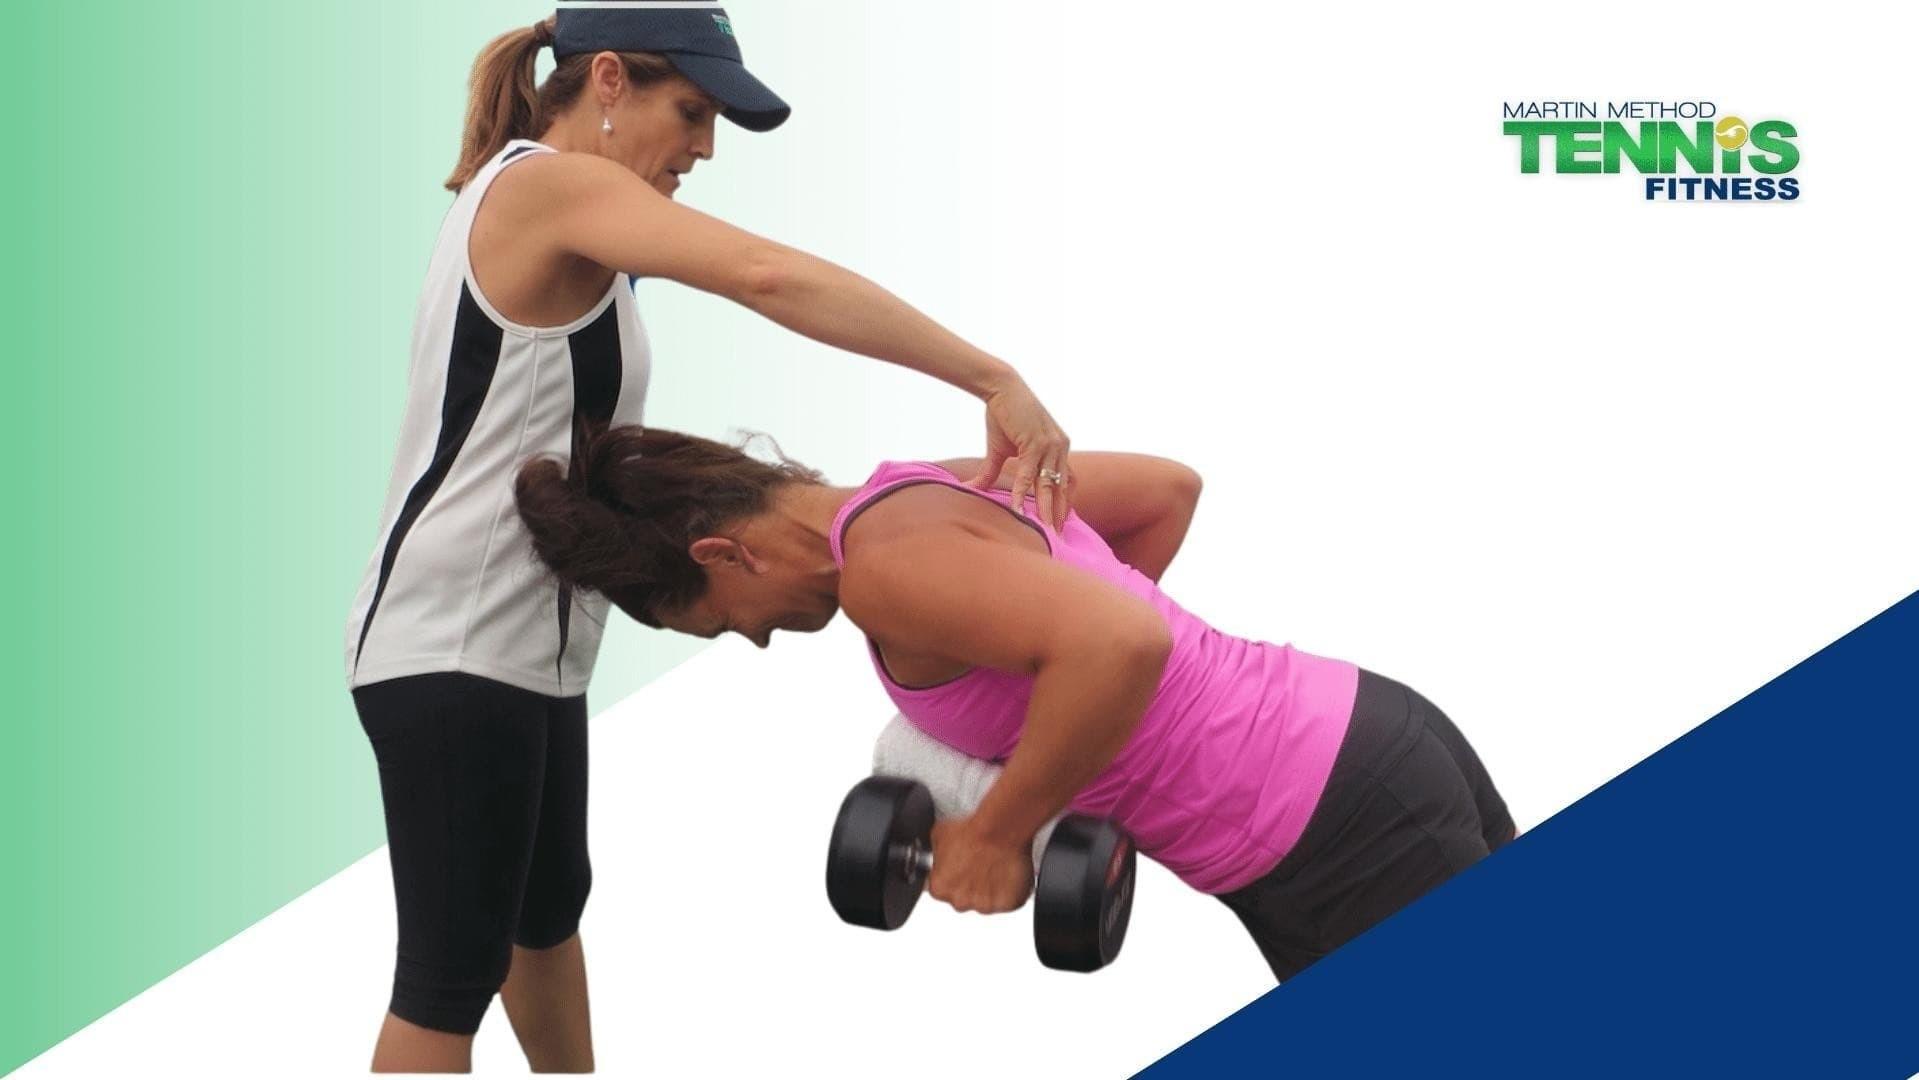 tennis-program-benefits